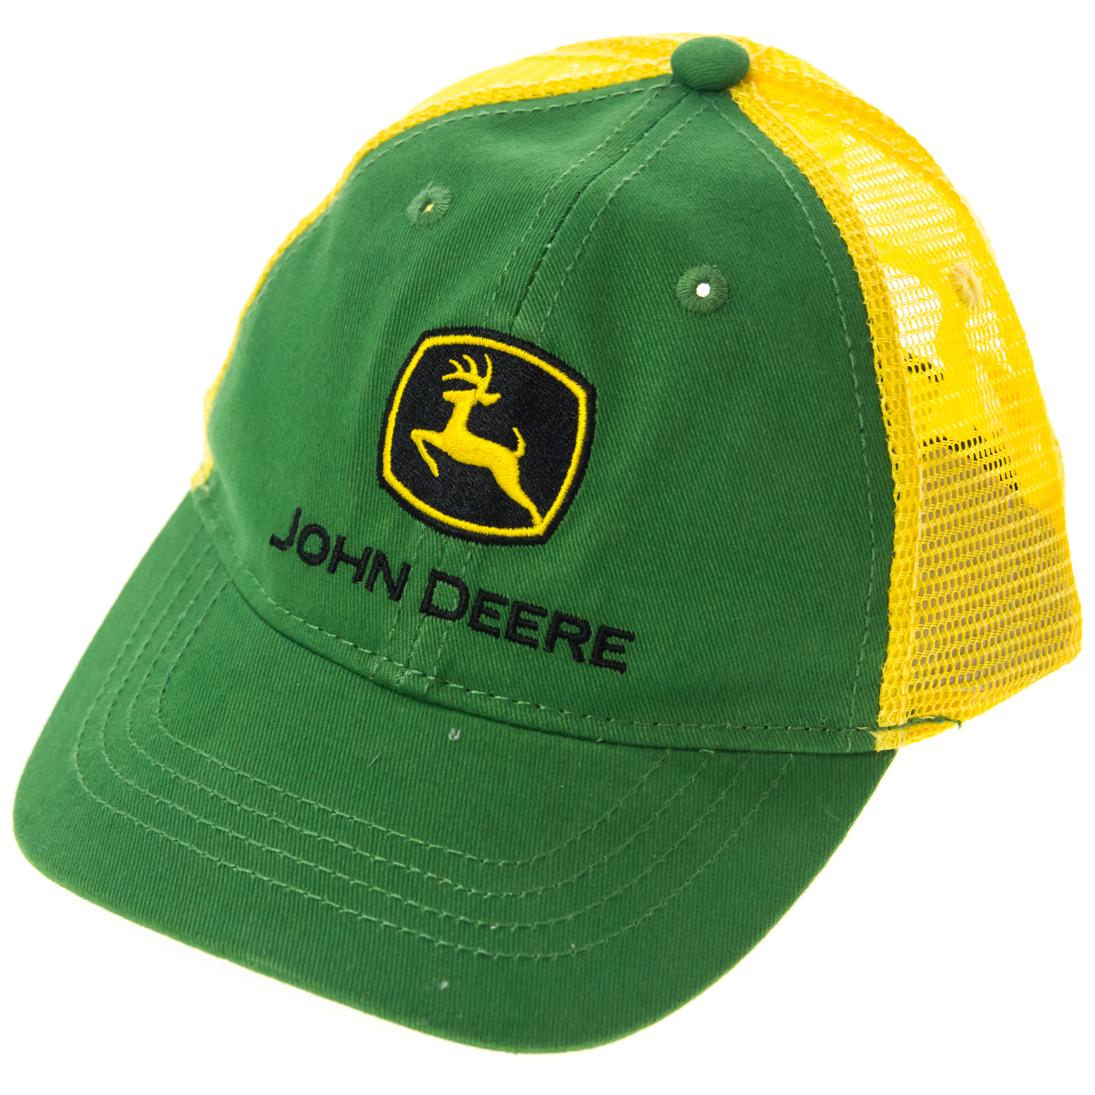 1e41b37c0b9a1 John Deere Trucker Hat